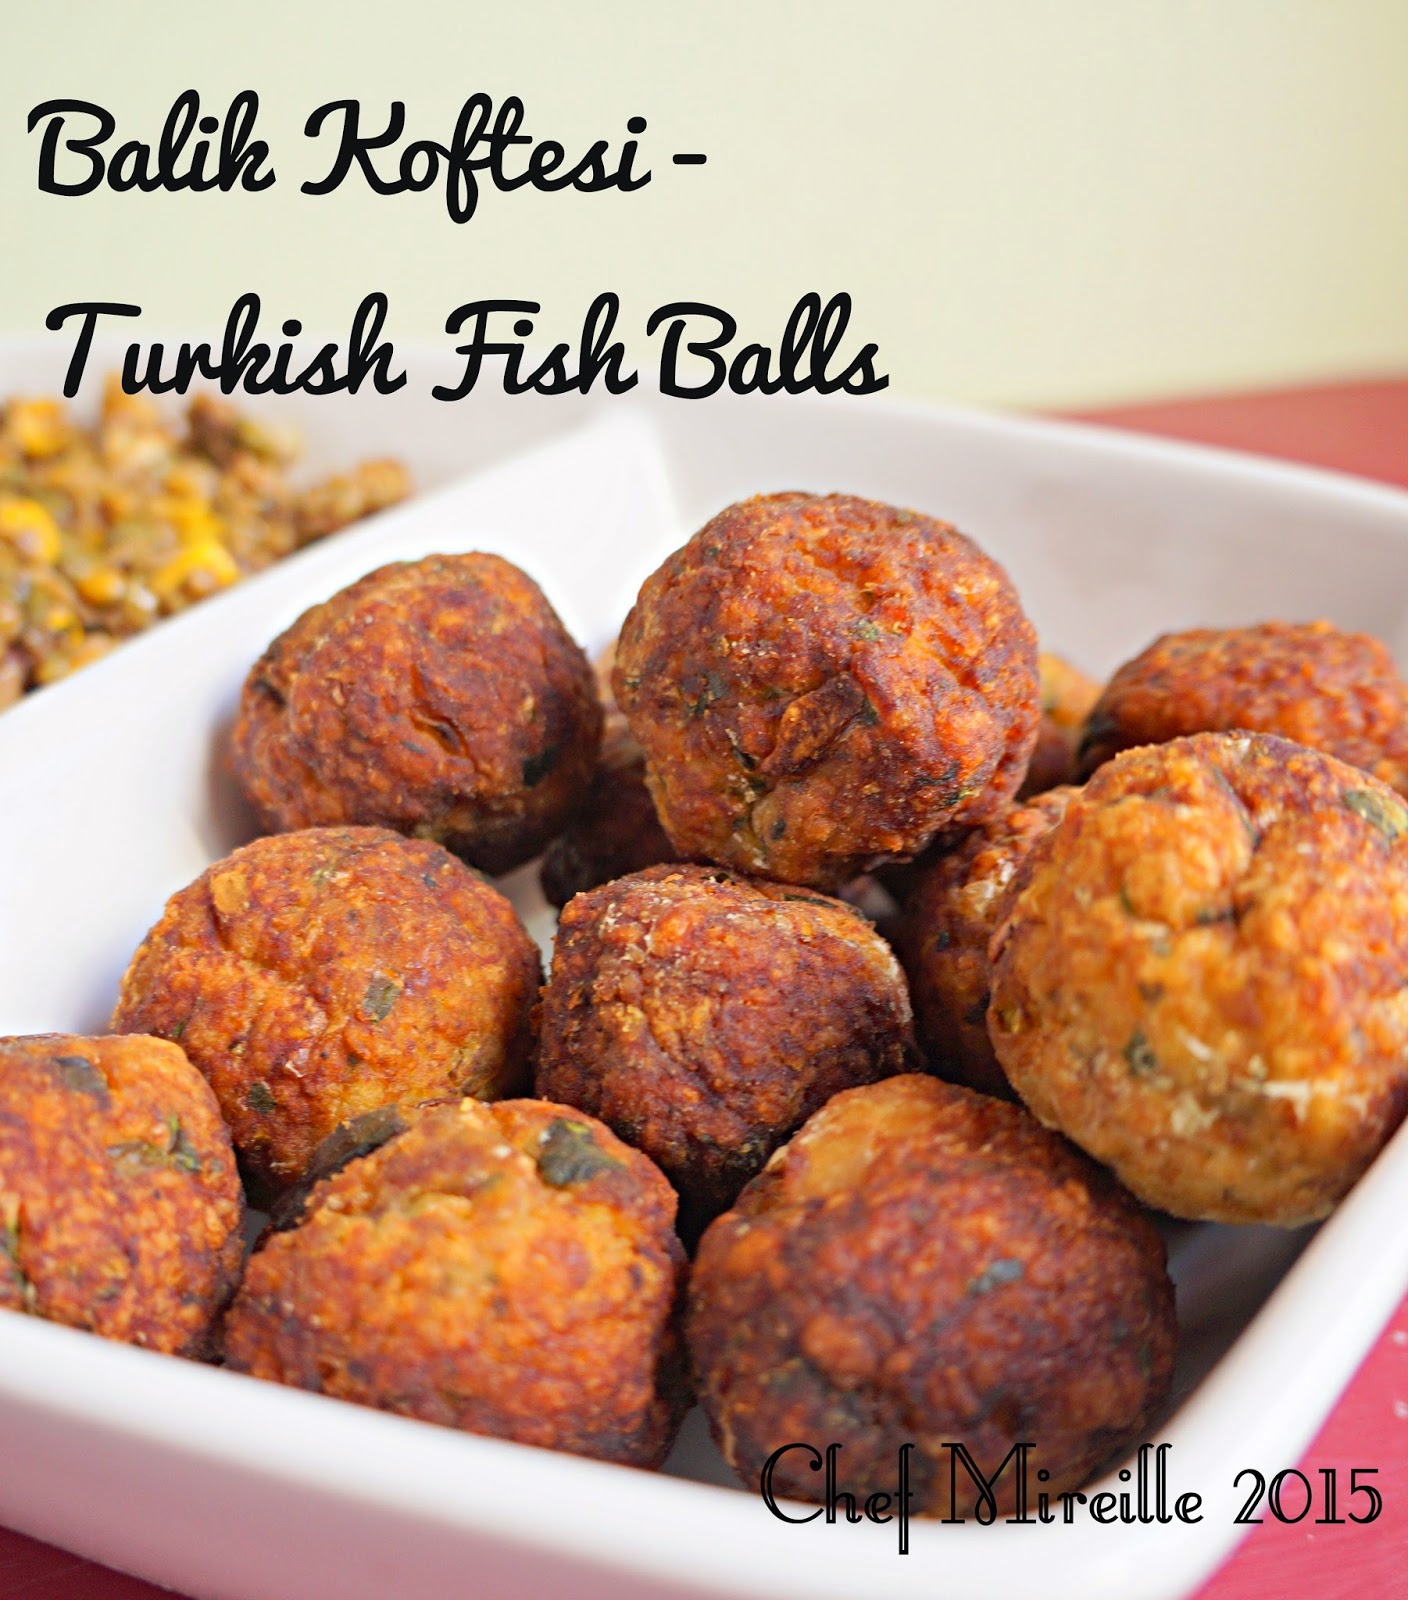 Turkish Fish Fritters